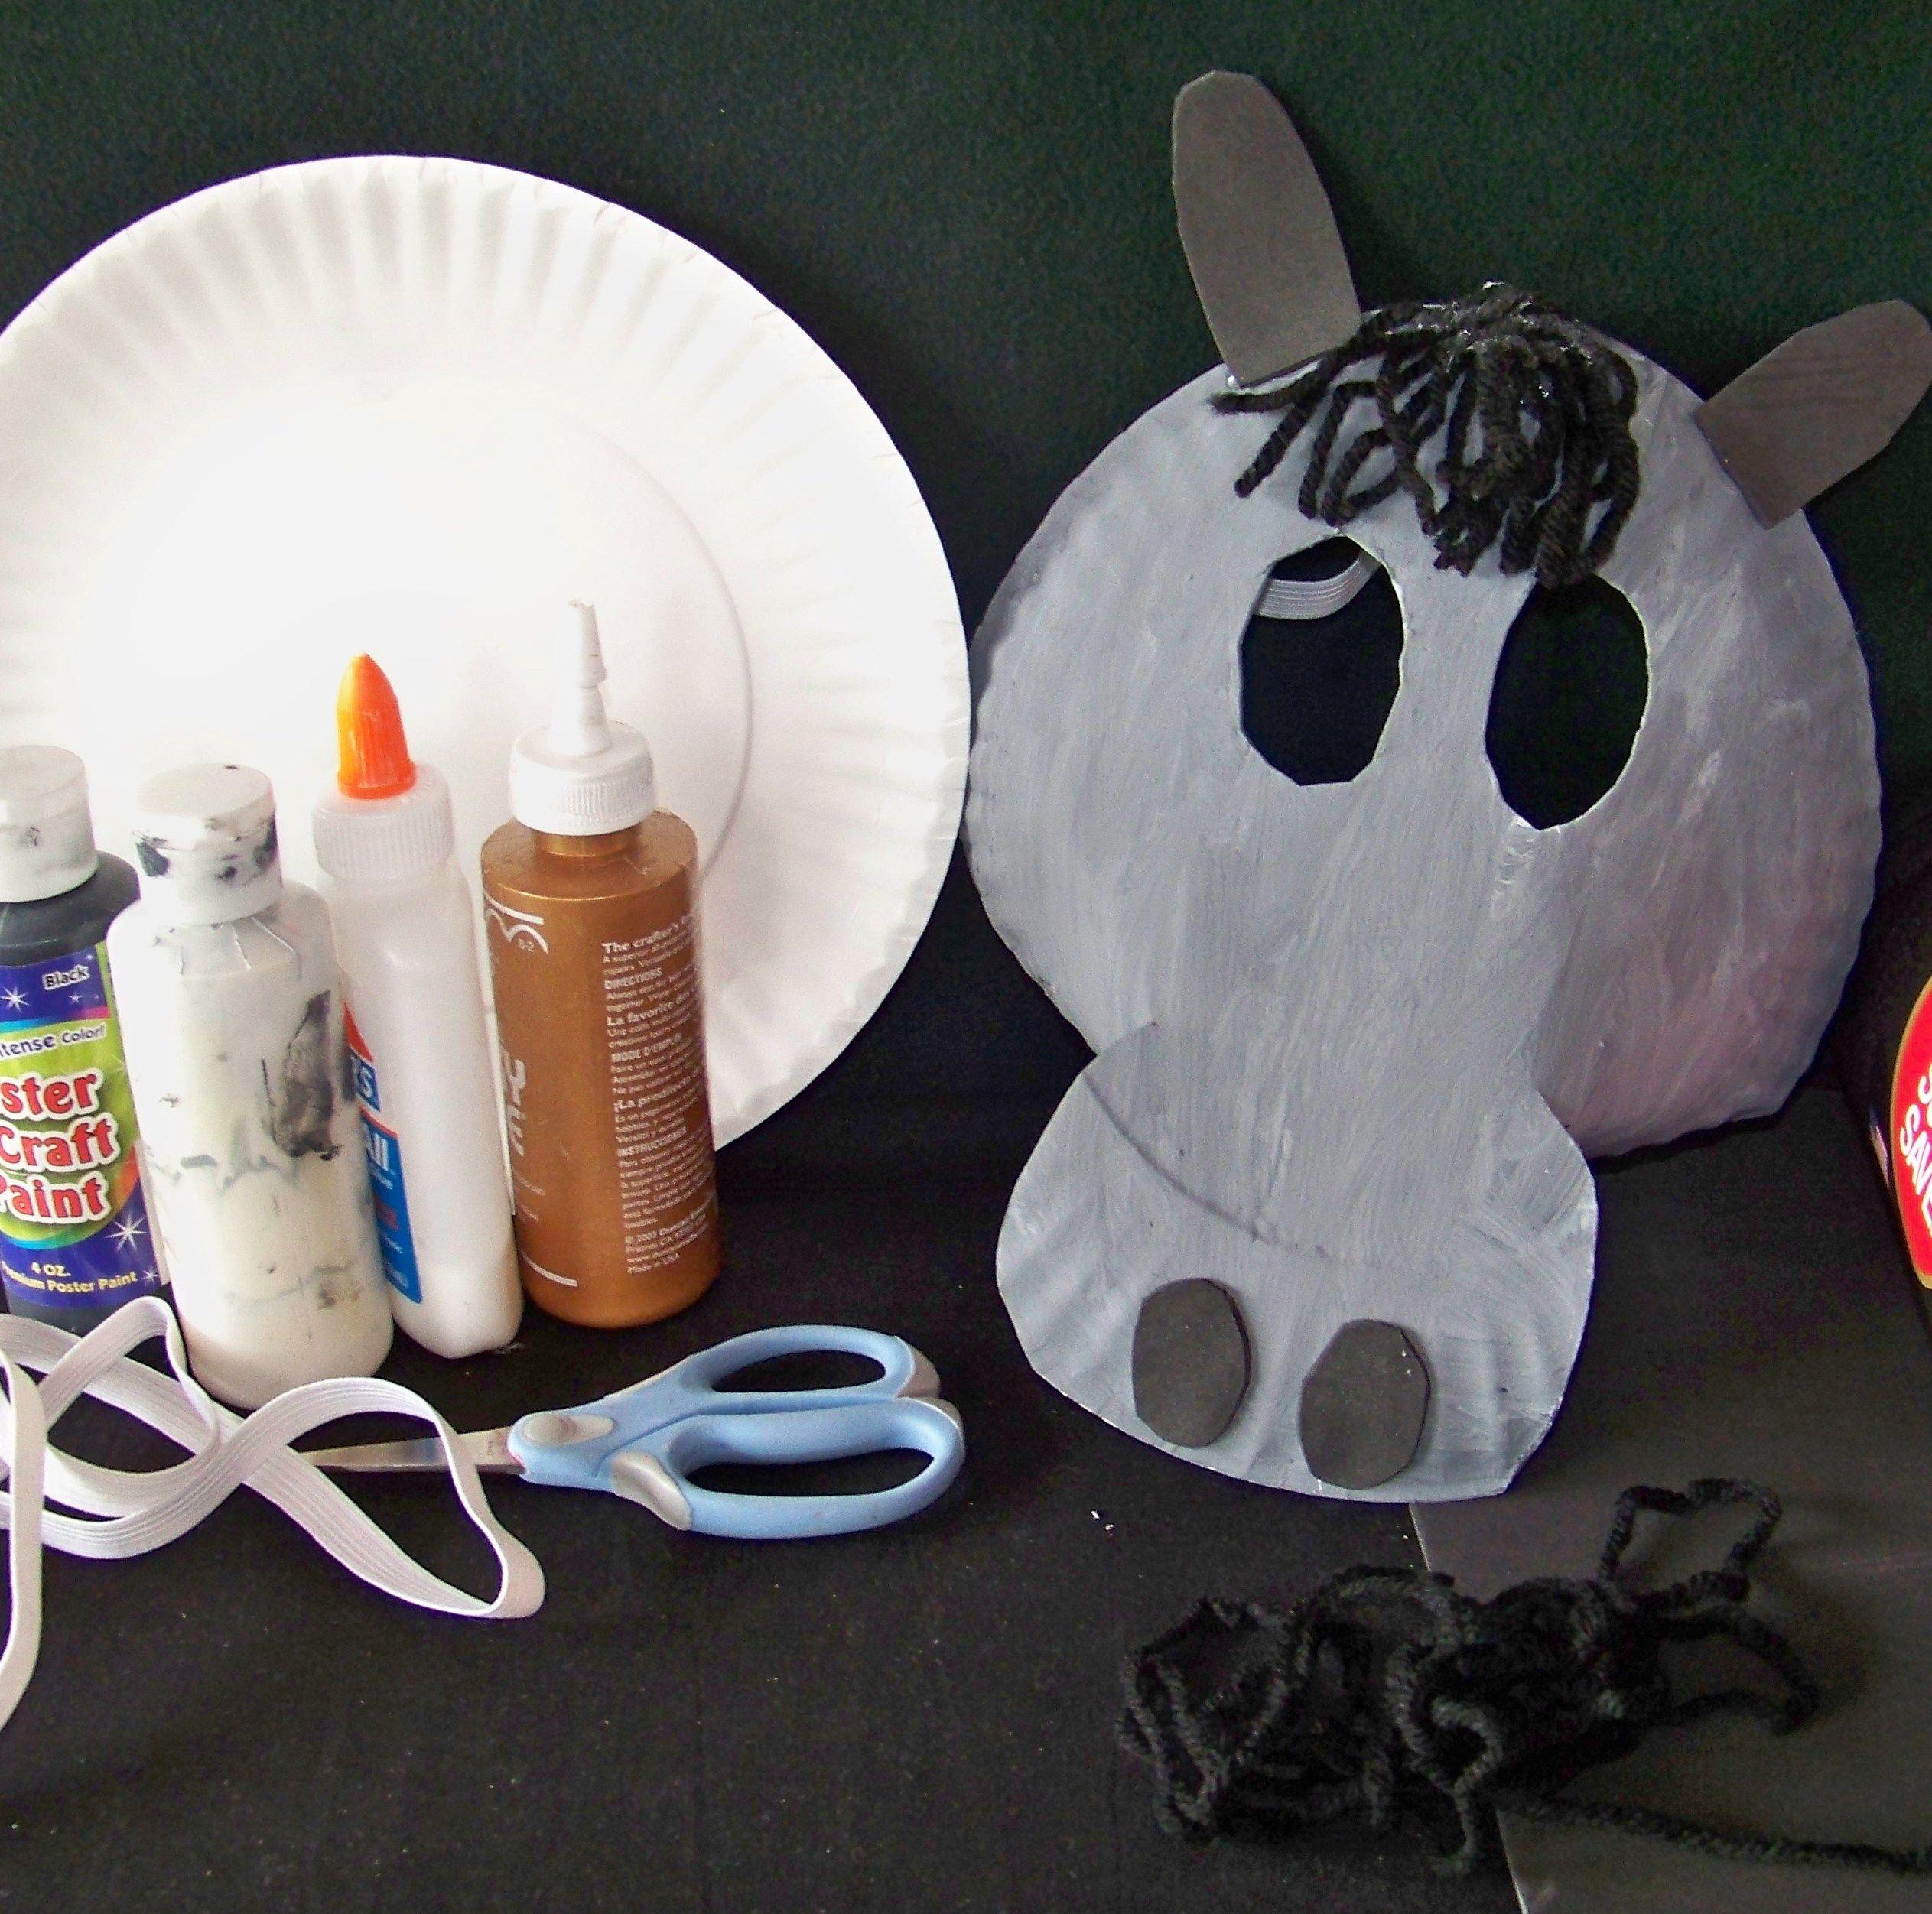 donkey mask crafts pinterest bremer stadtmusikanten esel und tiermasken. Black Bedroom Furniture Sets. Home Design Ideas